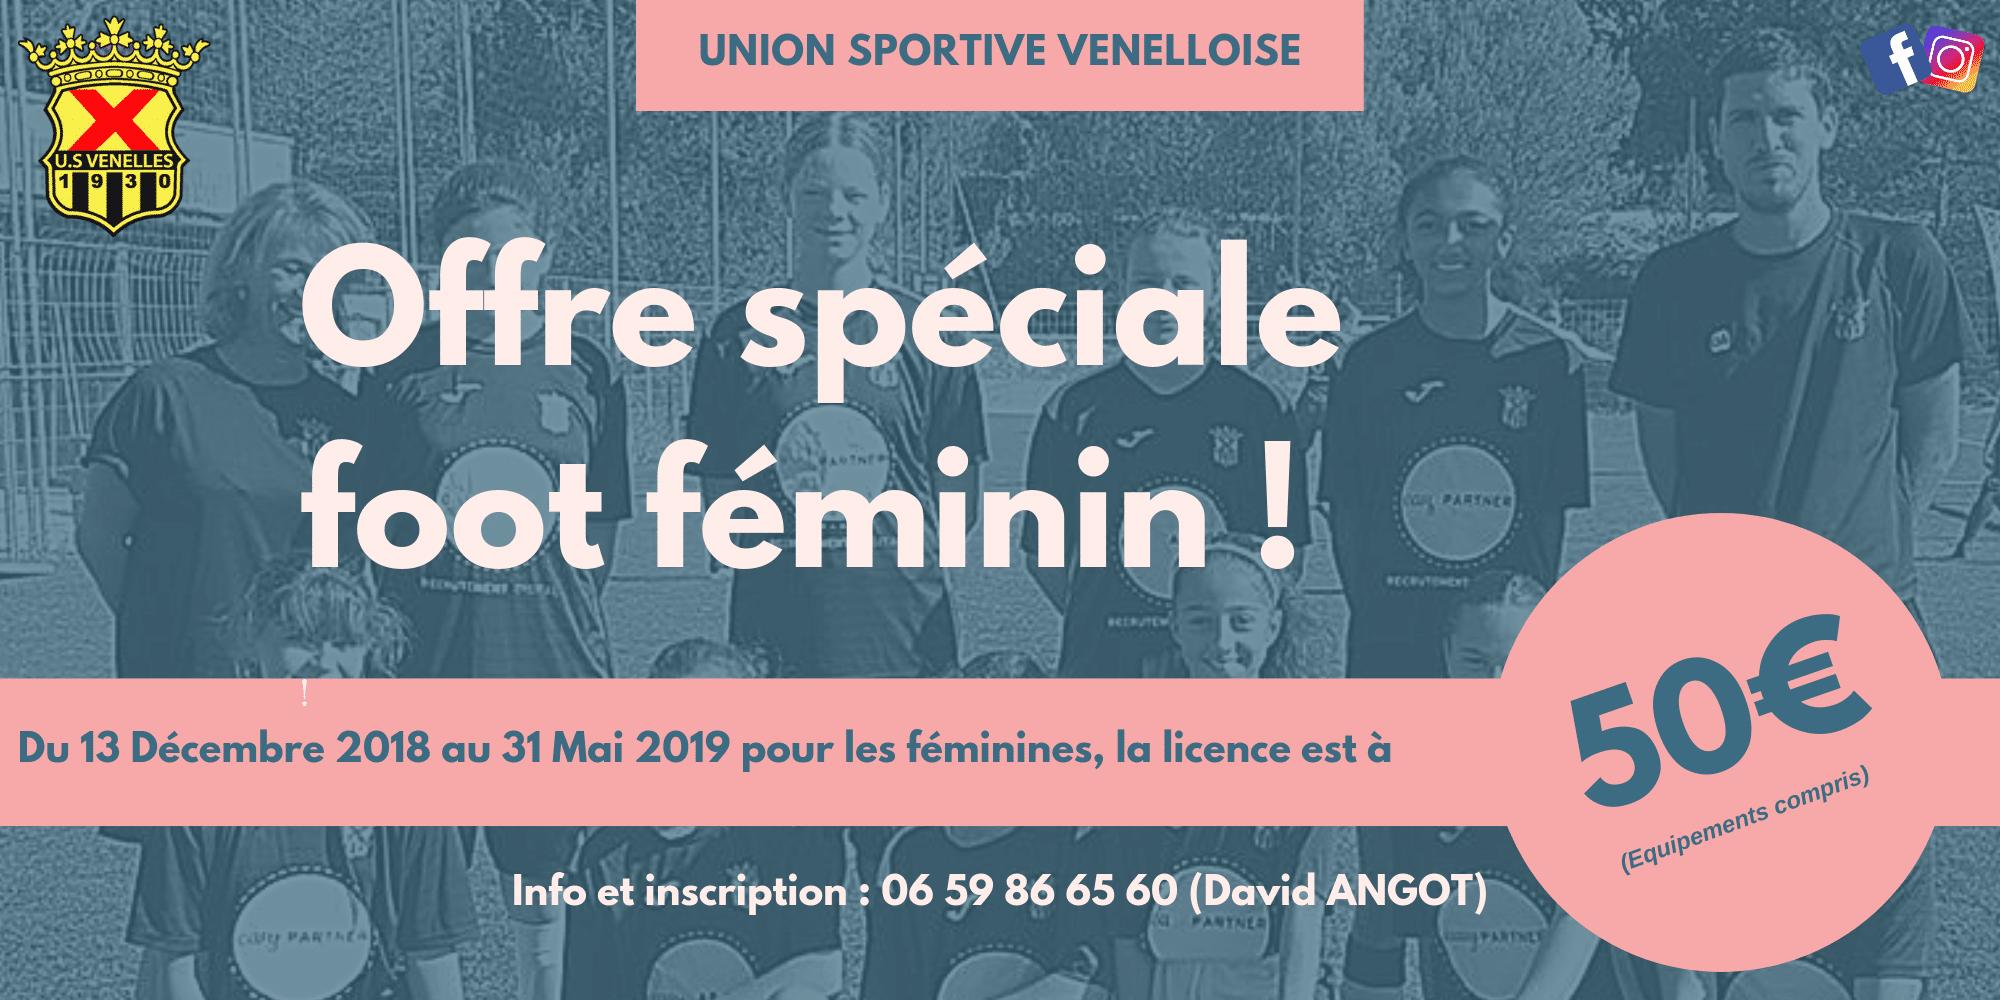 Offre spéciale Foot Féminin - USV